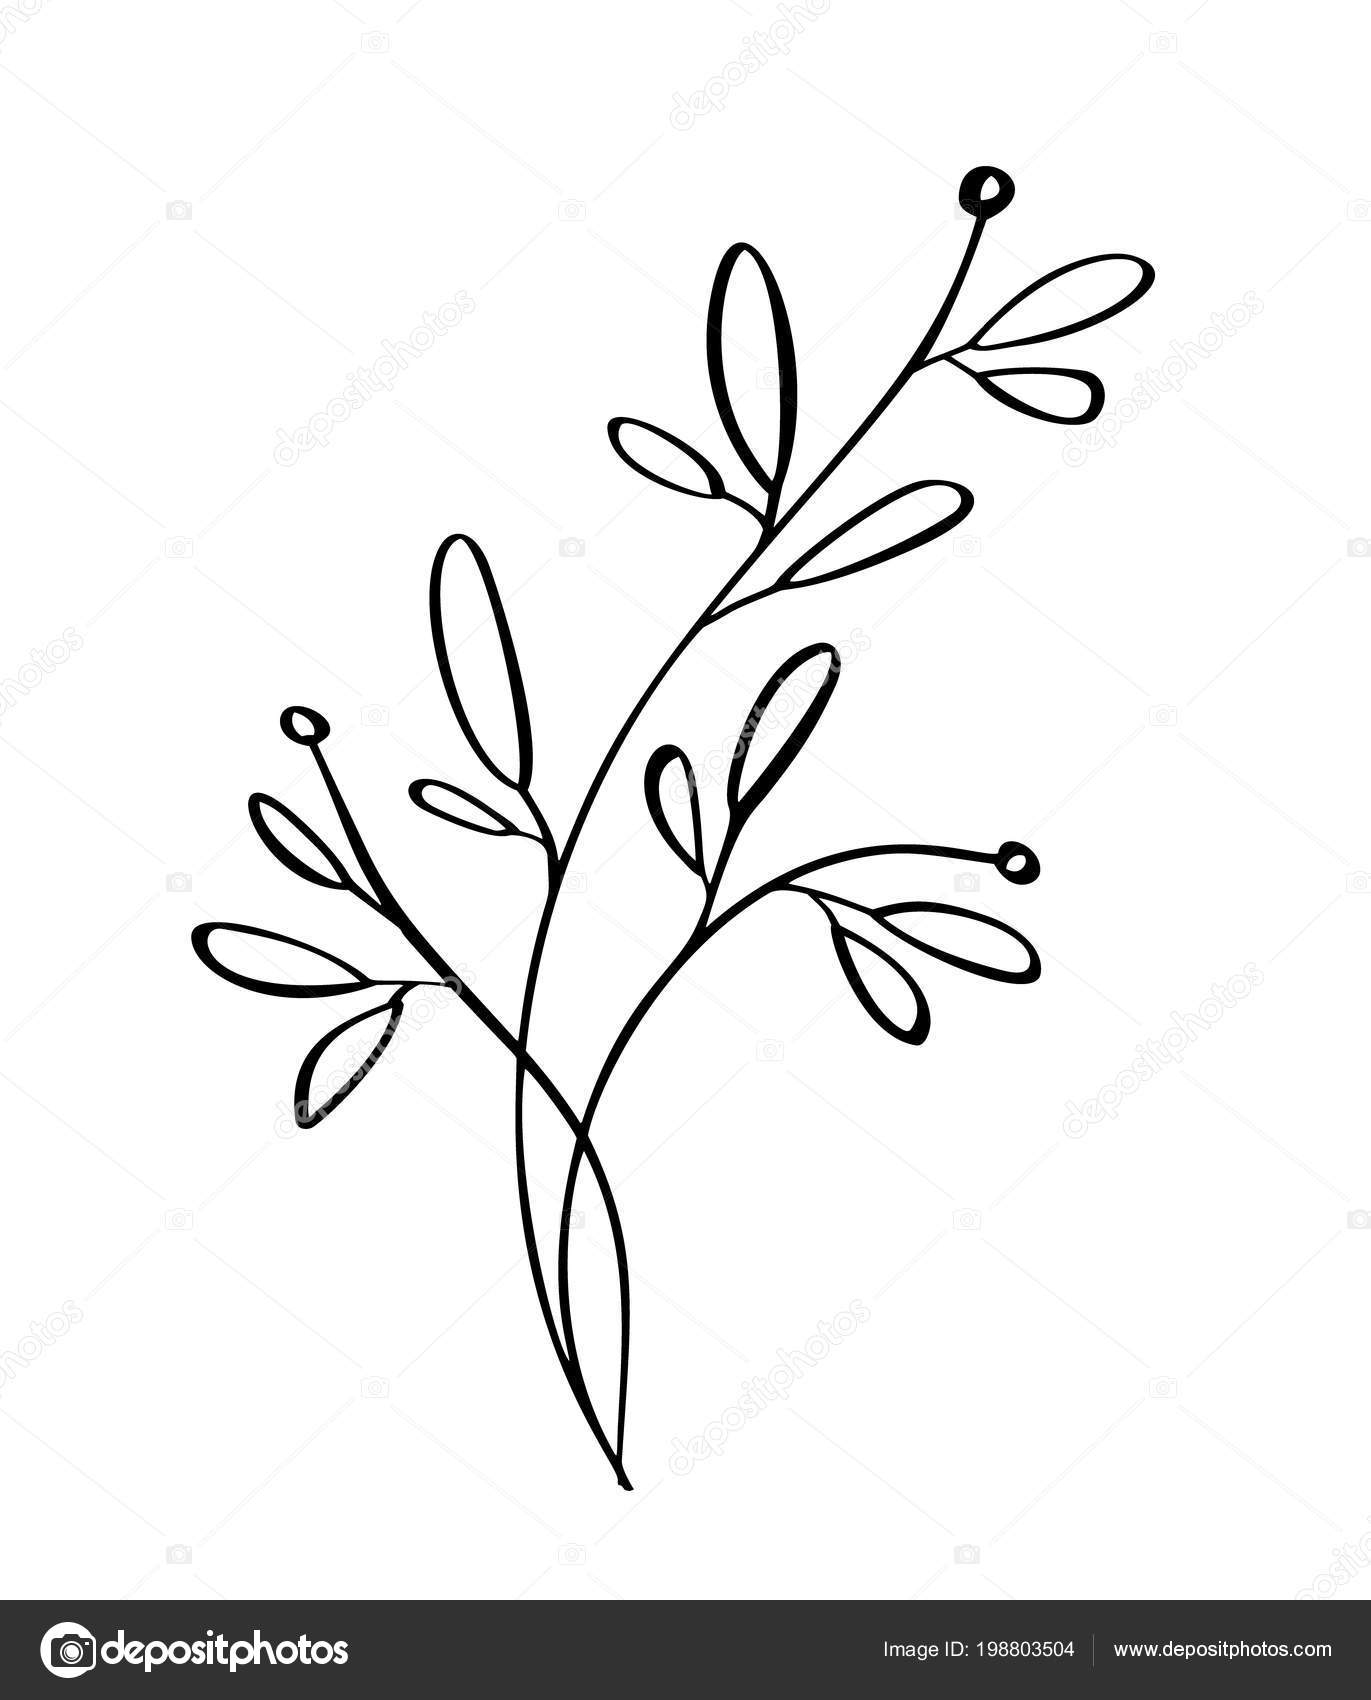 Moderni Kvetiny Rucne Kreslene Kresleni A Skica Kvetinove S